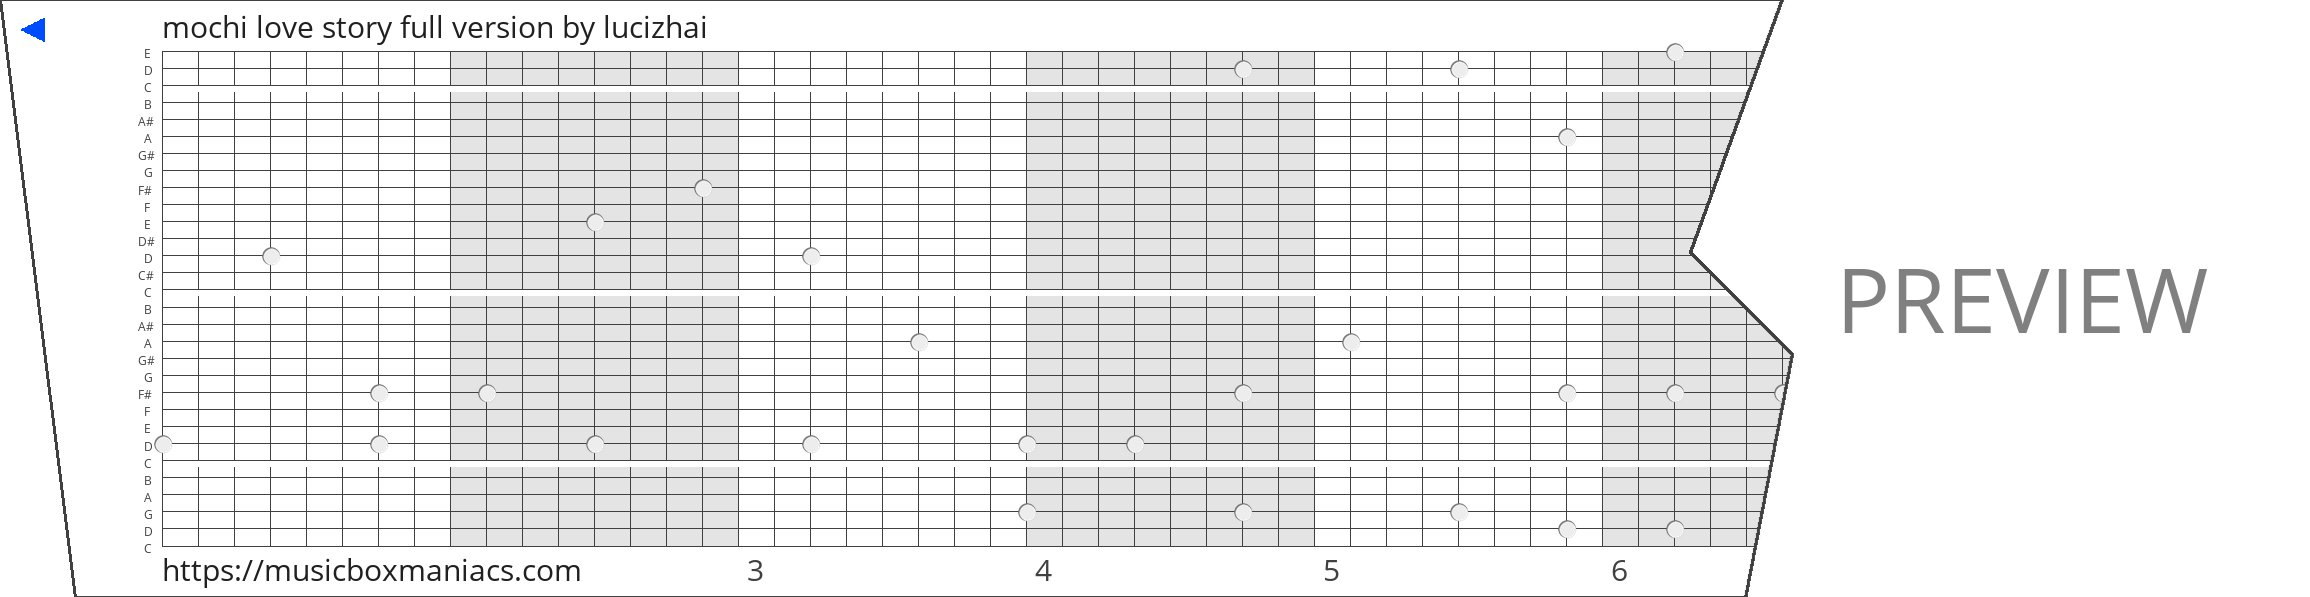 mochi love story full version 30 note music box paper strip